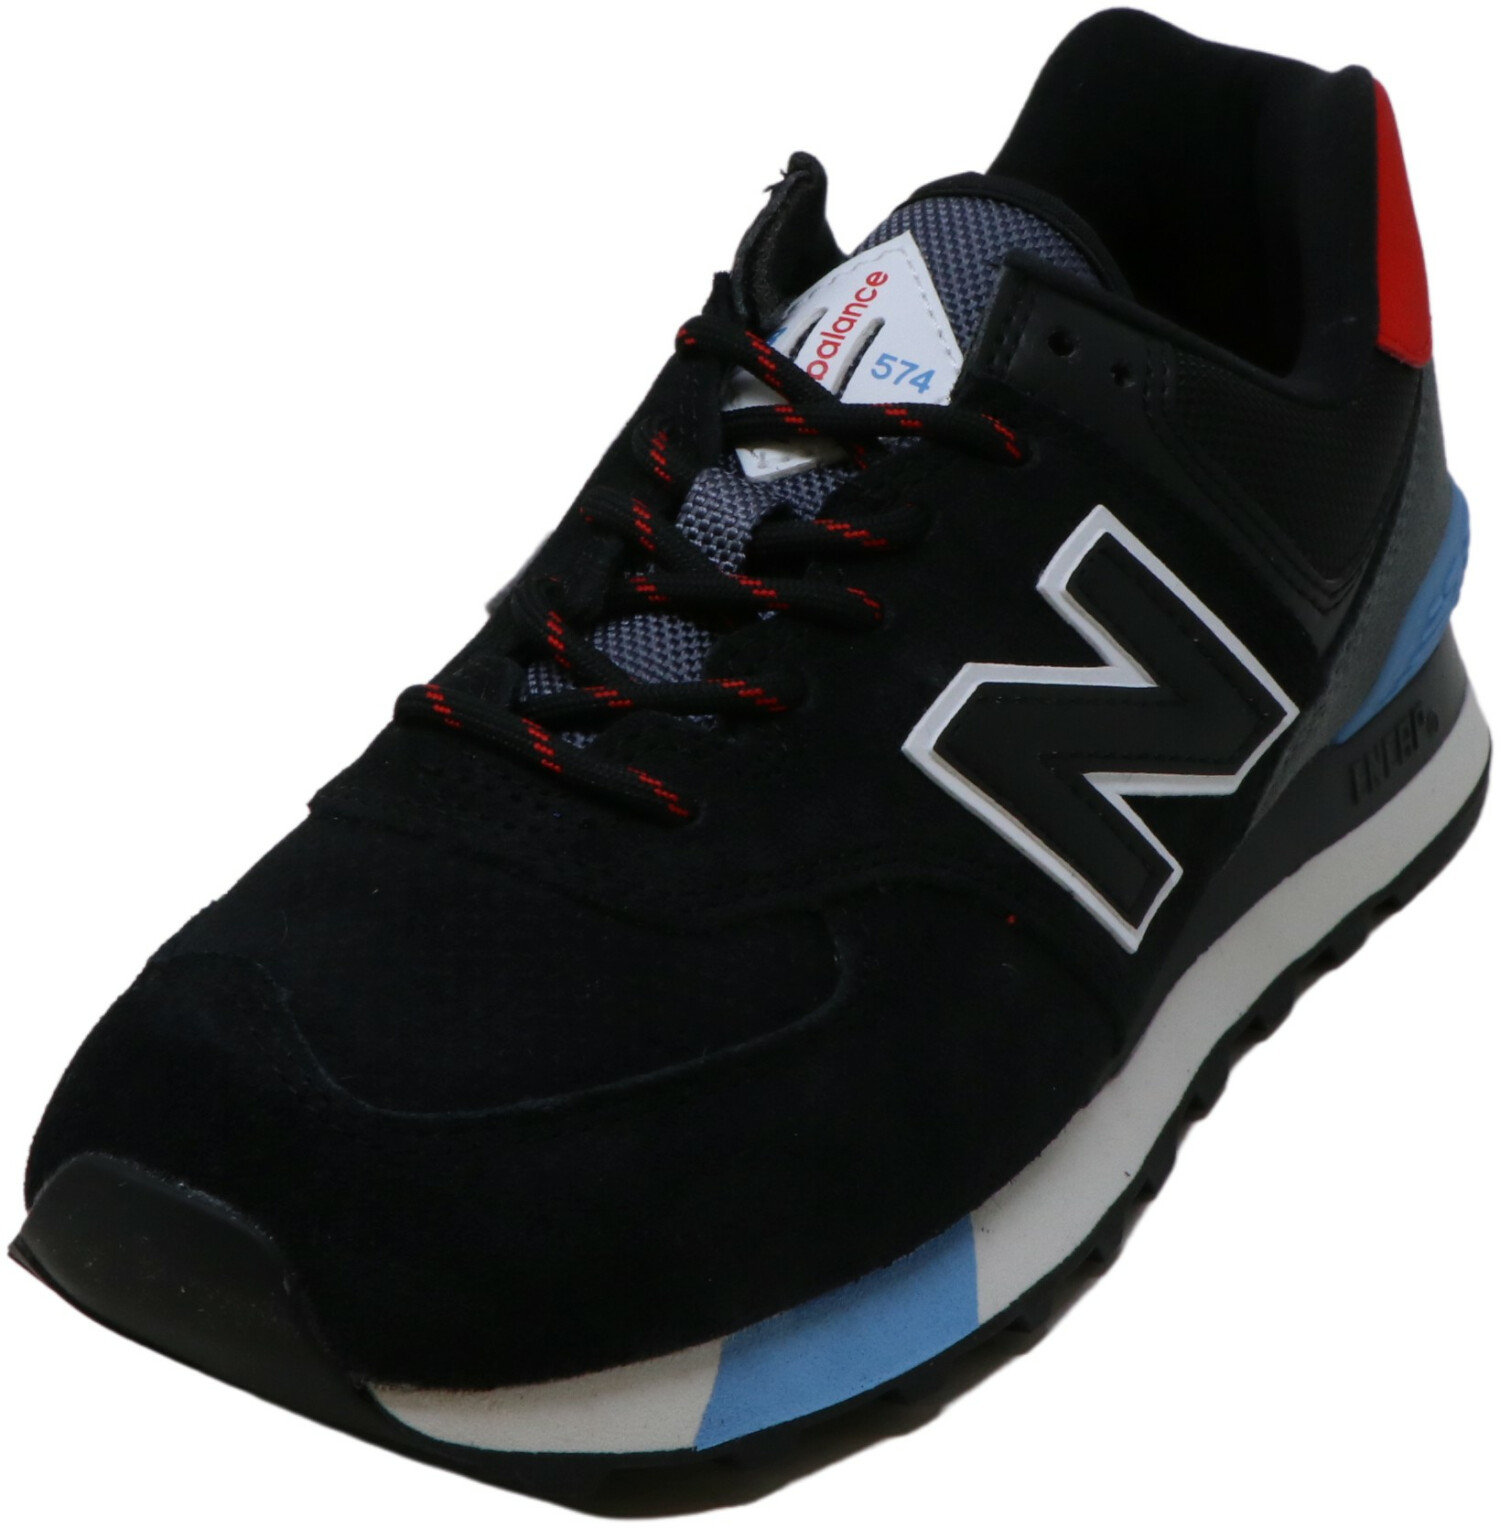 New Balance Men's Ml574 Jho Low Top Mesh Running - 6W